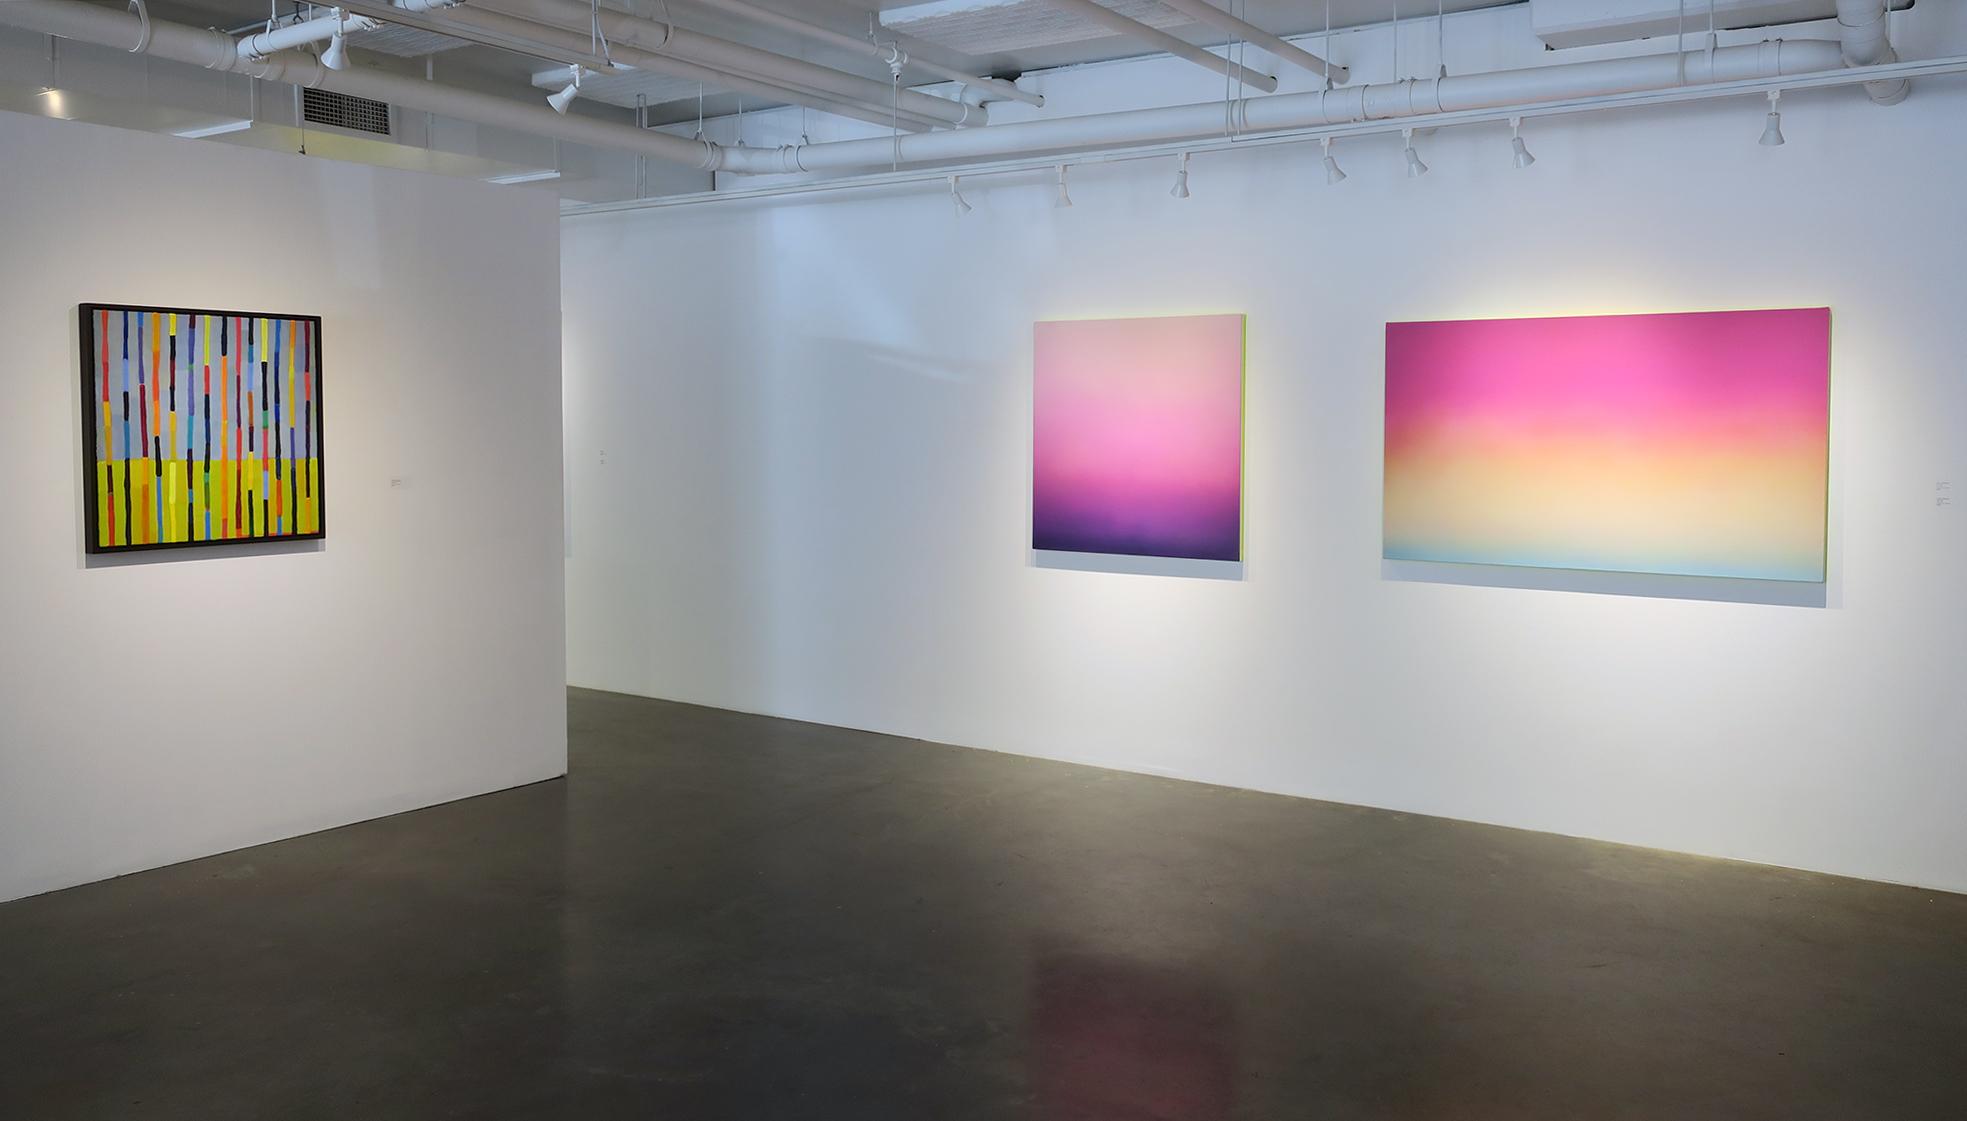 CIRCA Gallery, 2018 (Image: Laura Stack)